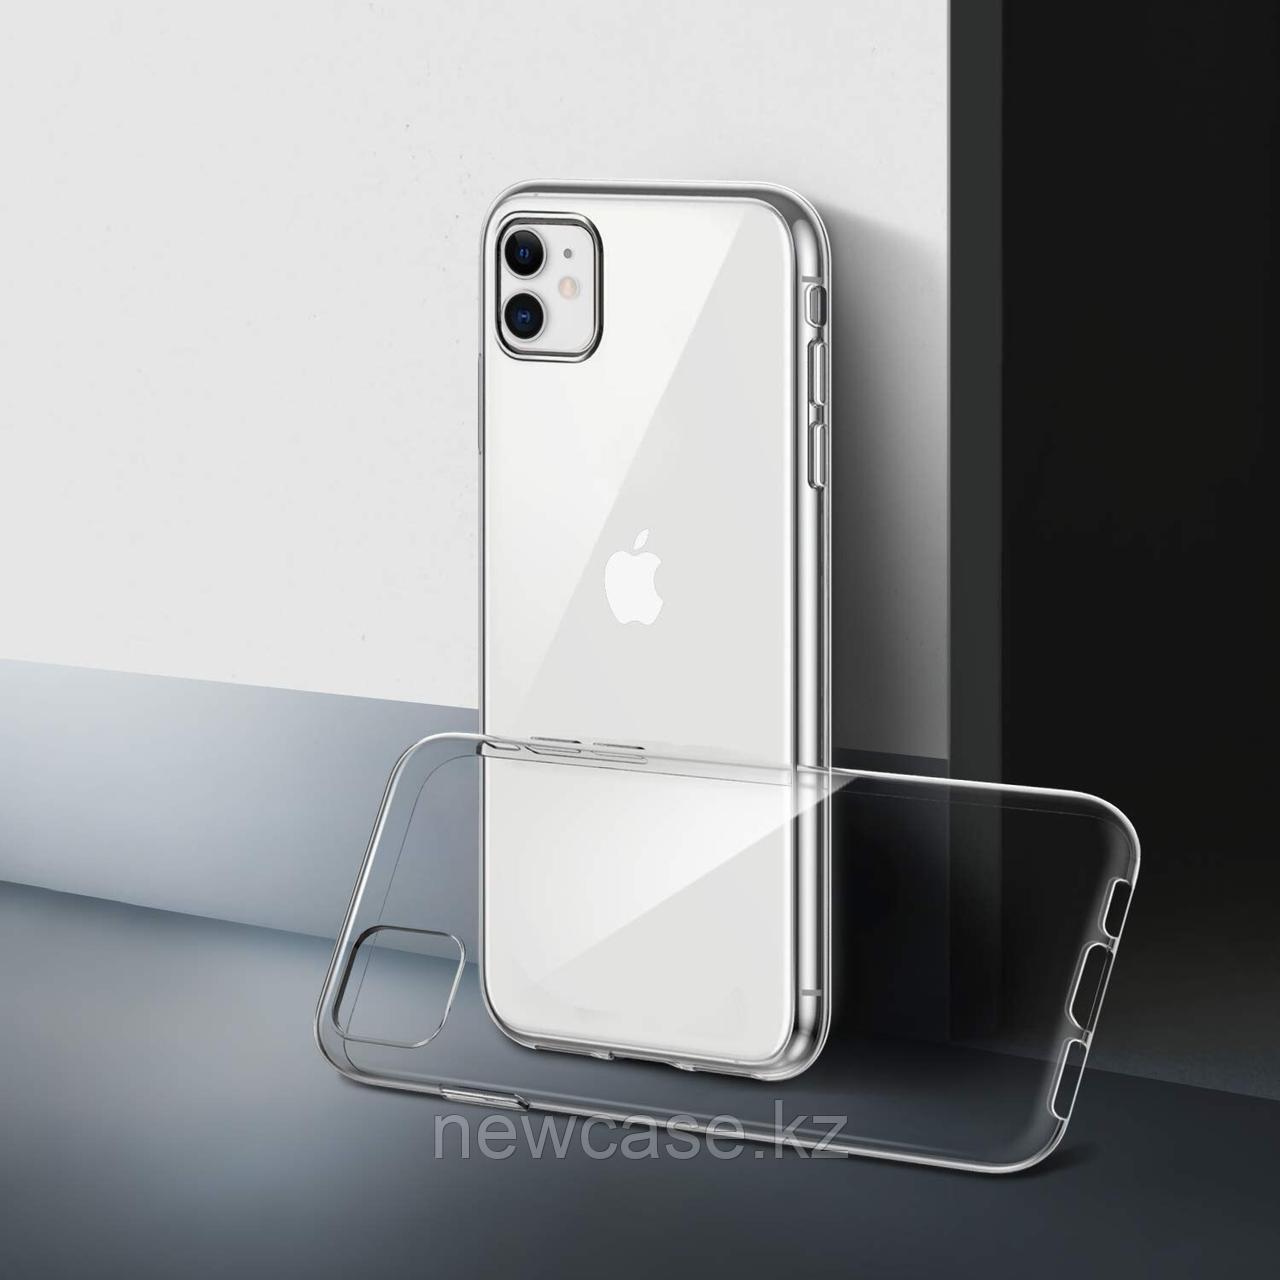 Силиконовый прозрачный чехол для iPhone 5/6/7/8/X/XR/XS Max/11/11 Pro/11 Pro Max - фото 1